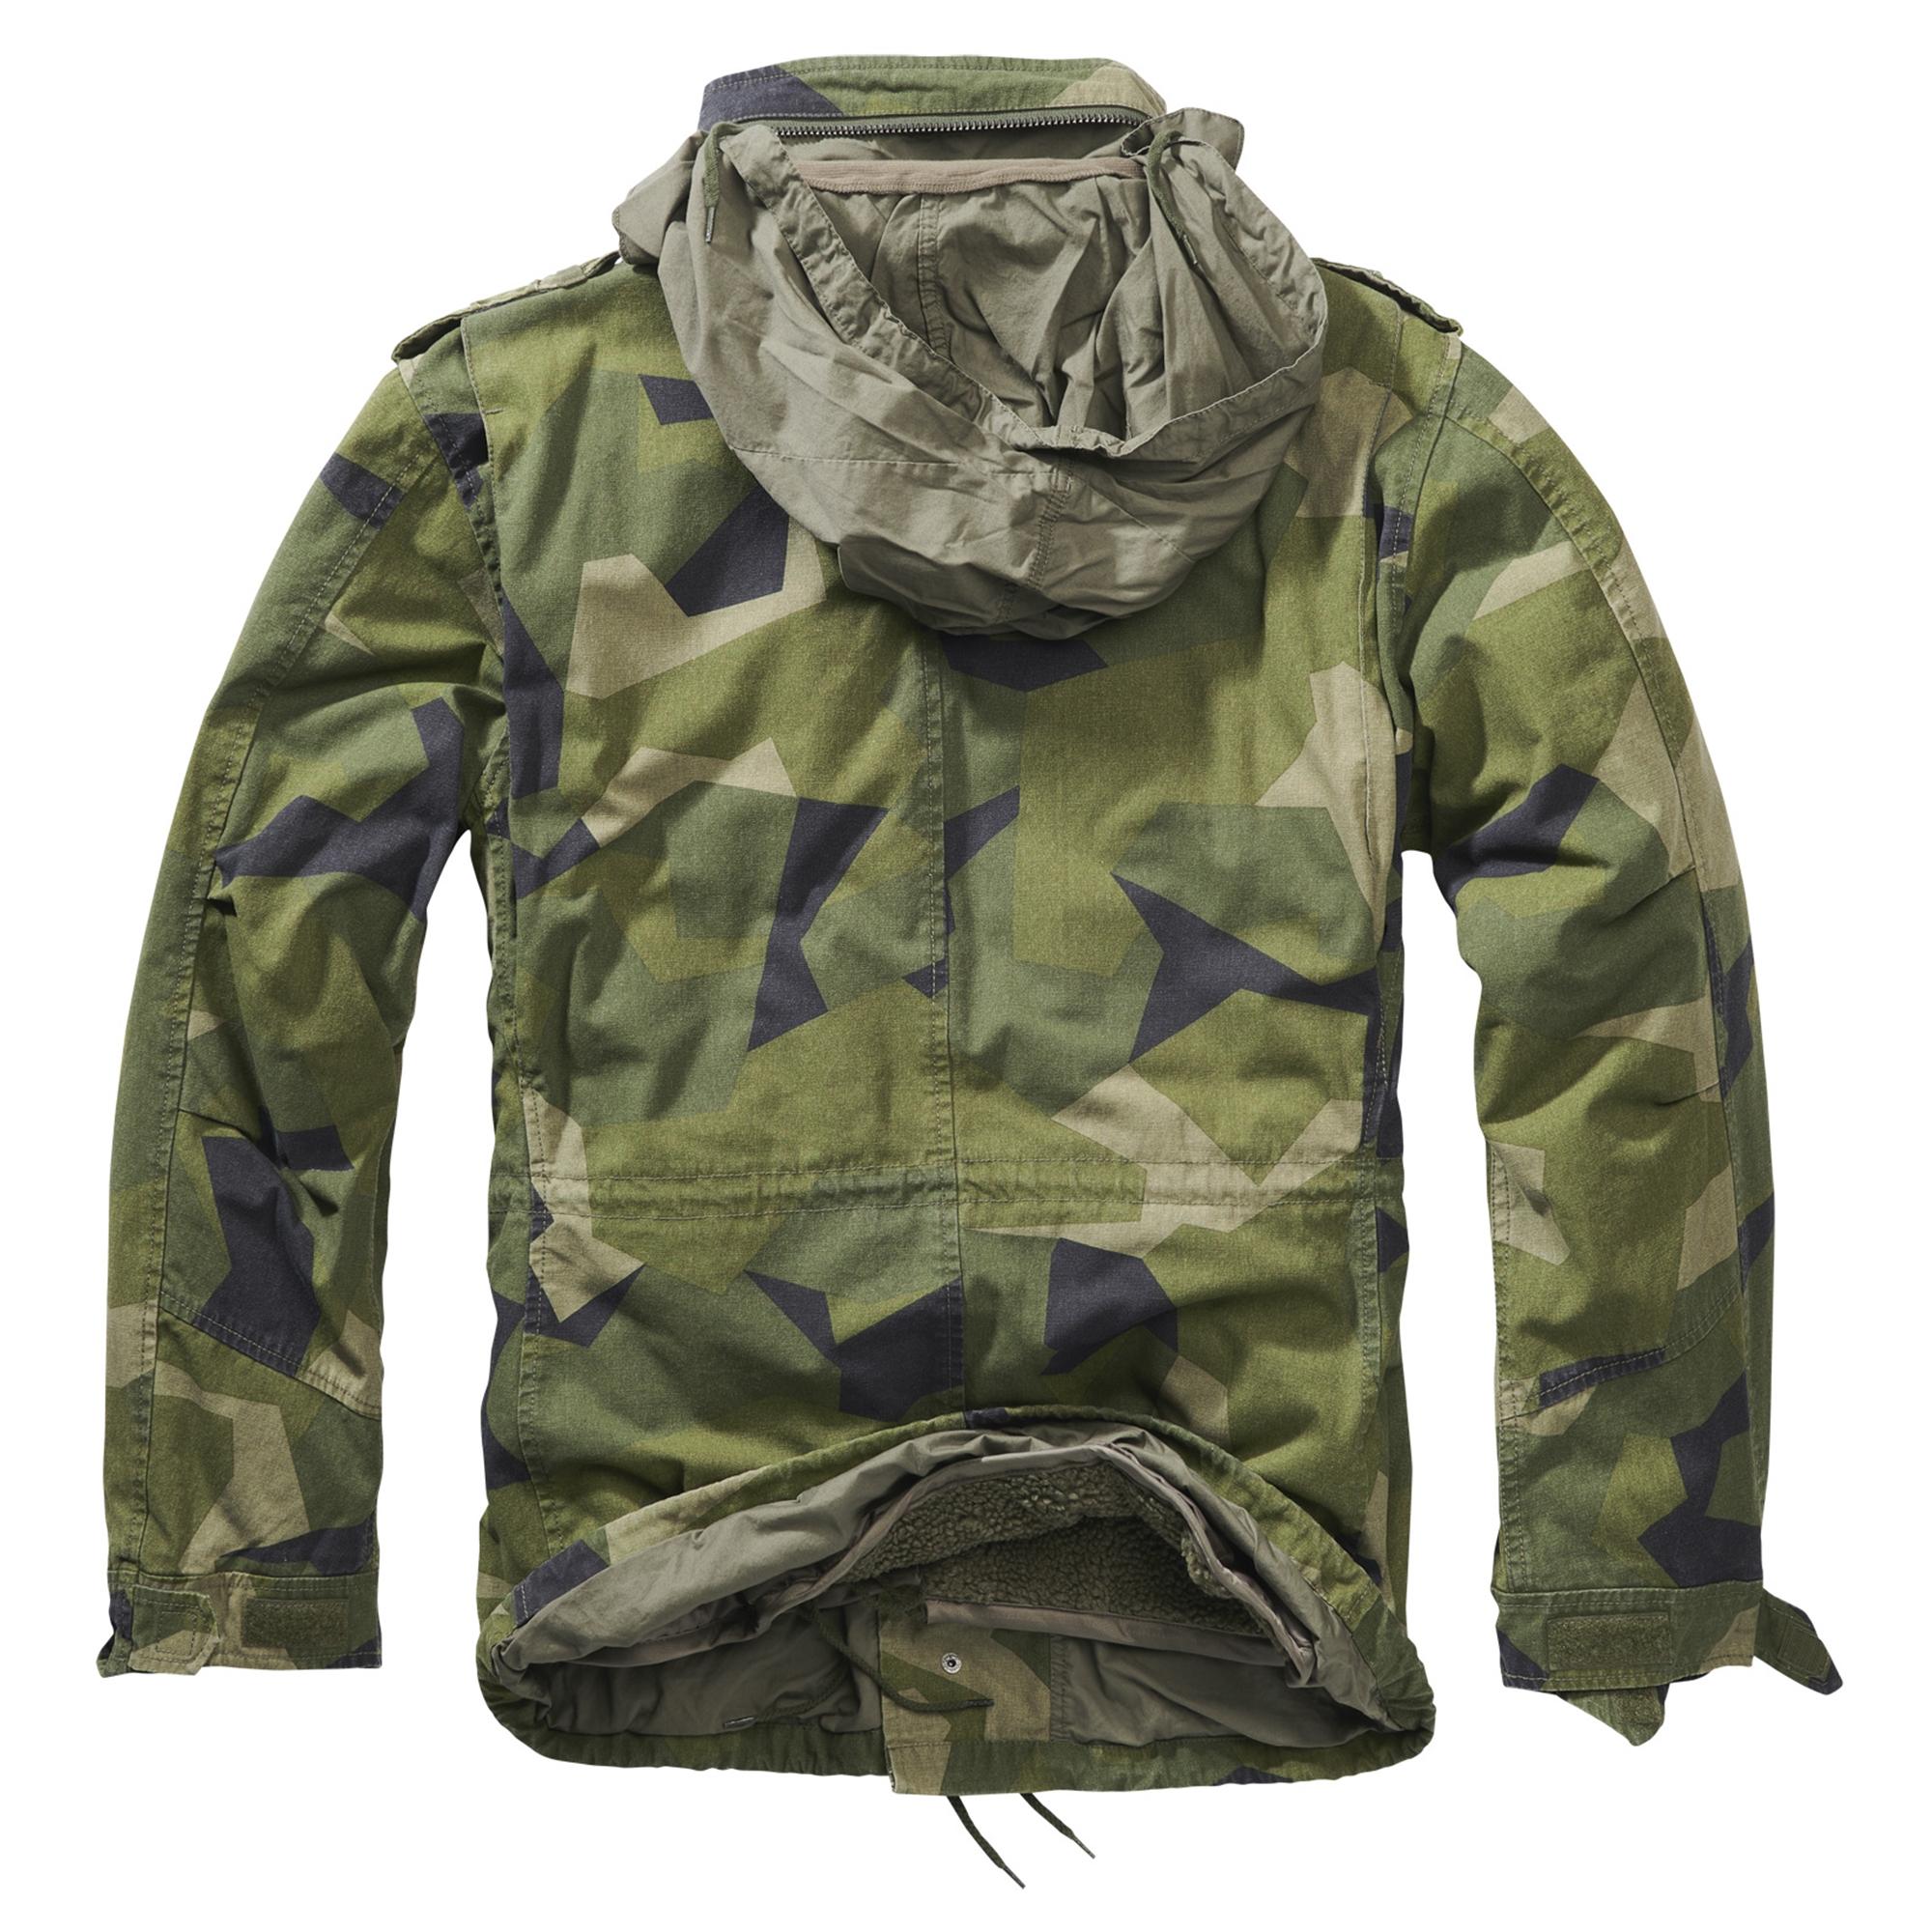 Brandit-M65-Giant-Herren-Jacke-Vintage-Feldjacke-Army-Outdoor-Parka-Futter-S-7XL Indexbild 25